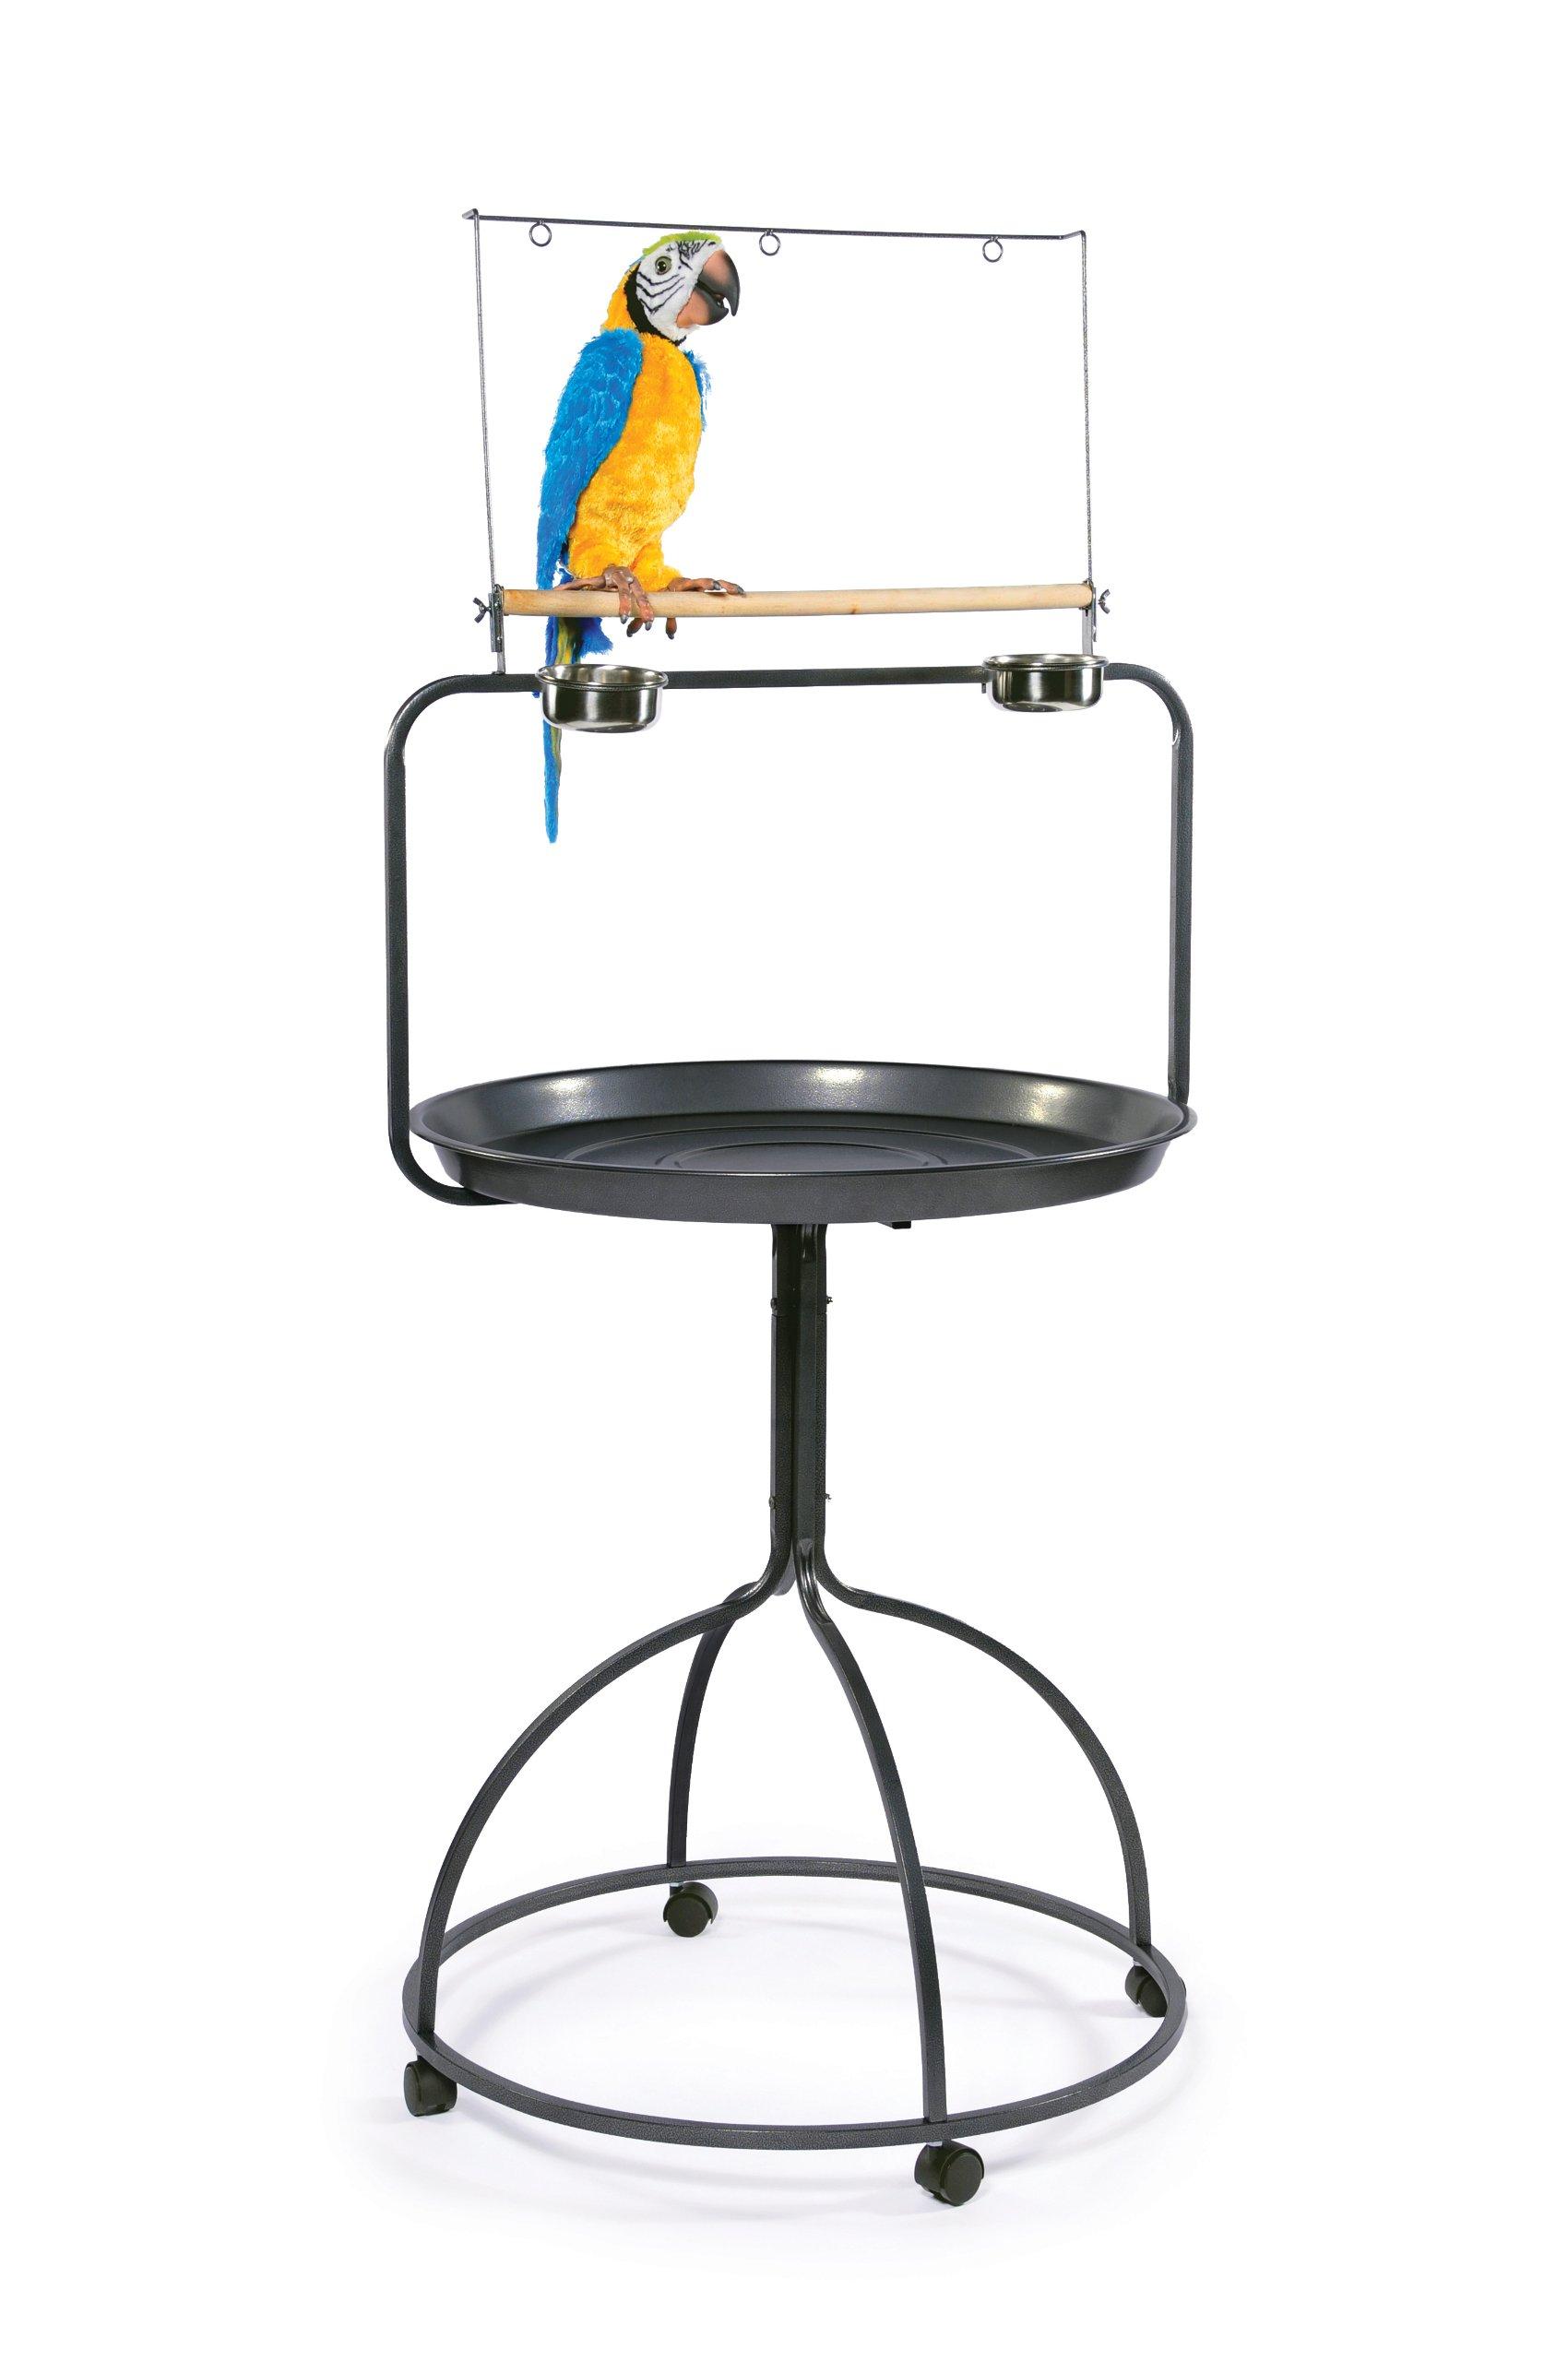 Prevue Hendryx 3183 Parrot Playstand, Round